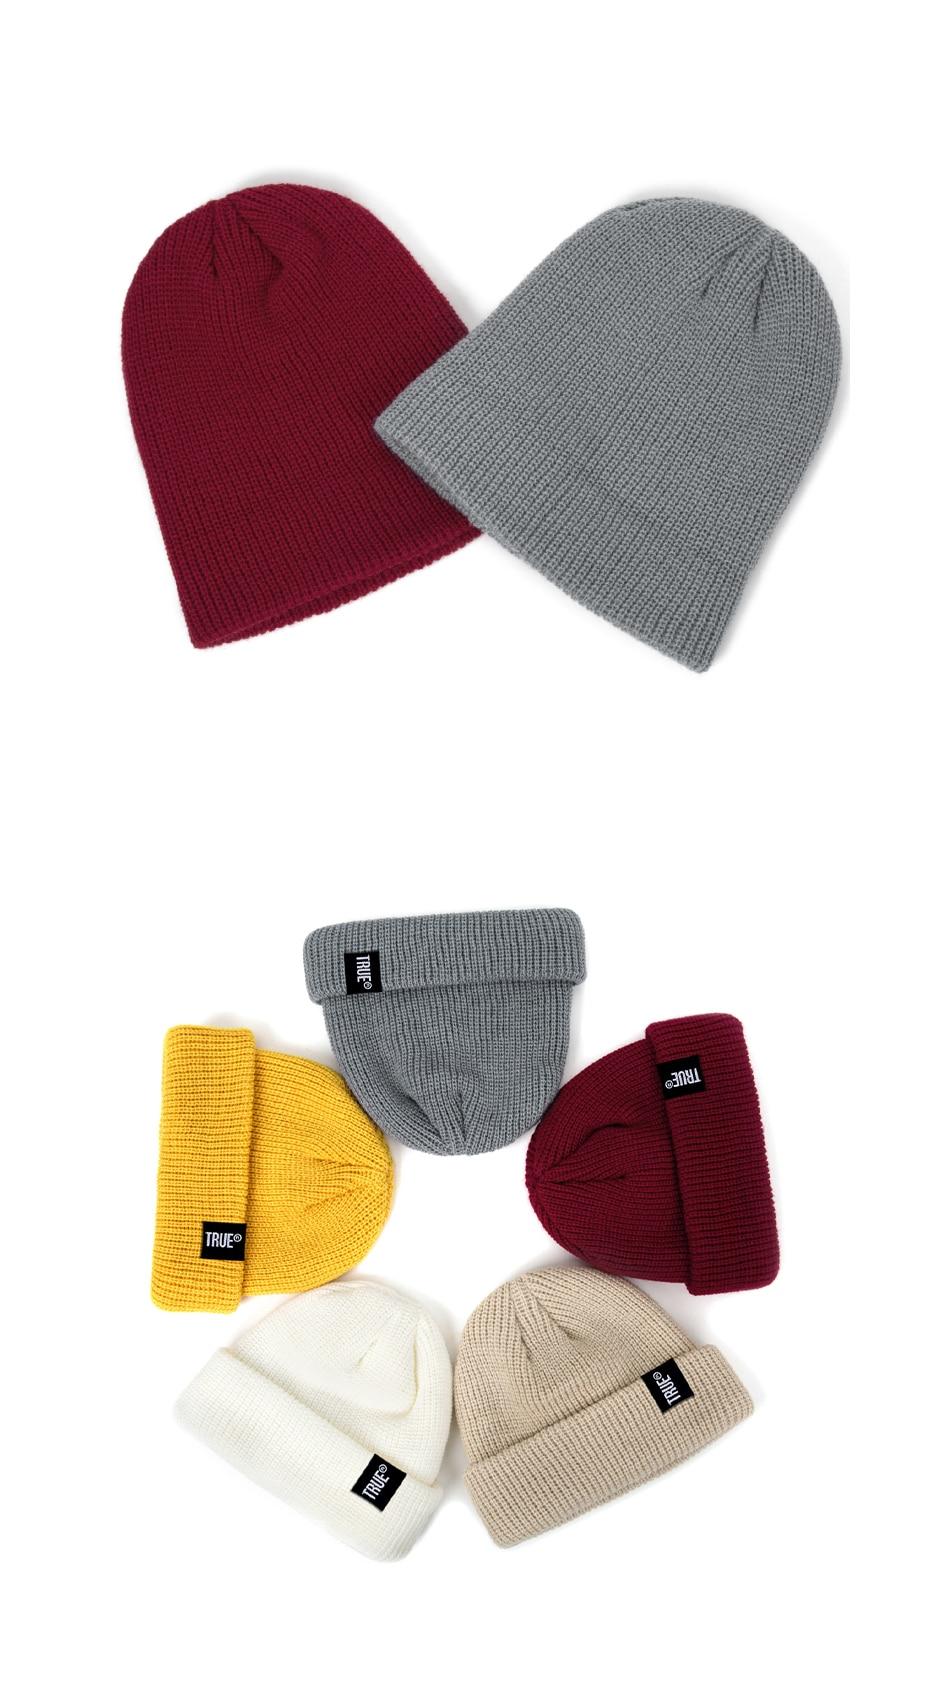 2019 Fashion Unisex Winter Hat Men Cuffed Cib Knit Hat Short Melon Ski Beanies Autumn Winter Solid Color Casual Beanie Hat 40